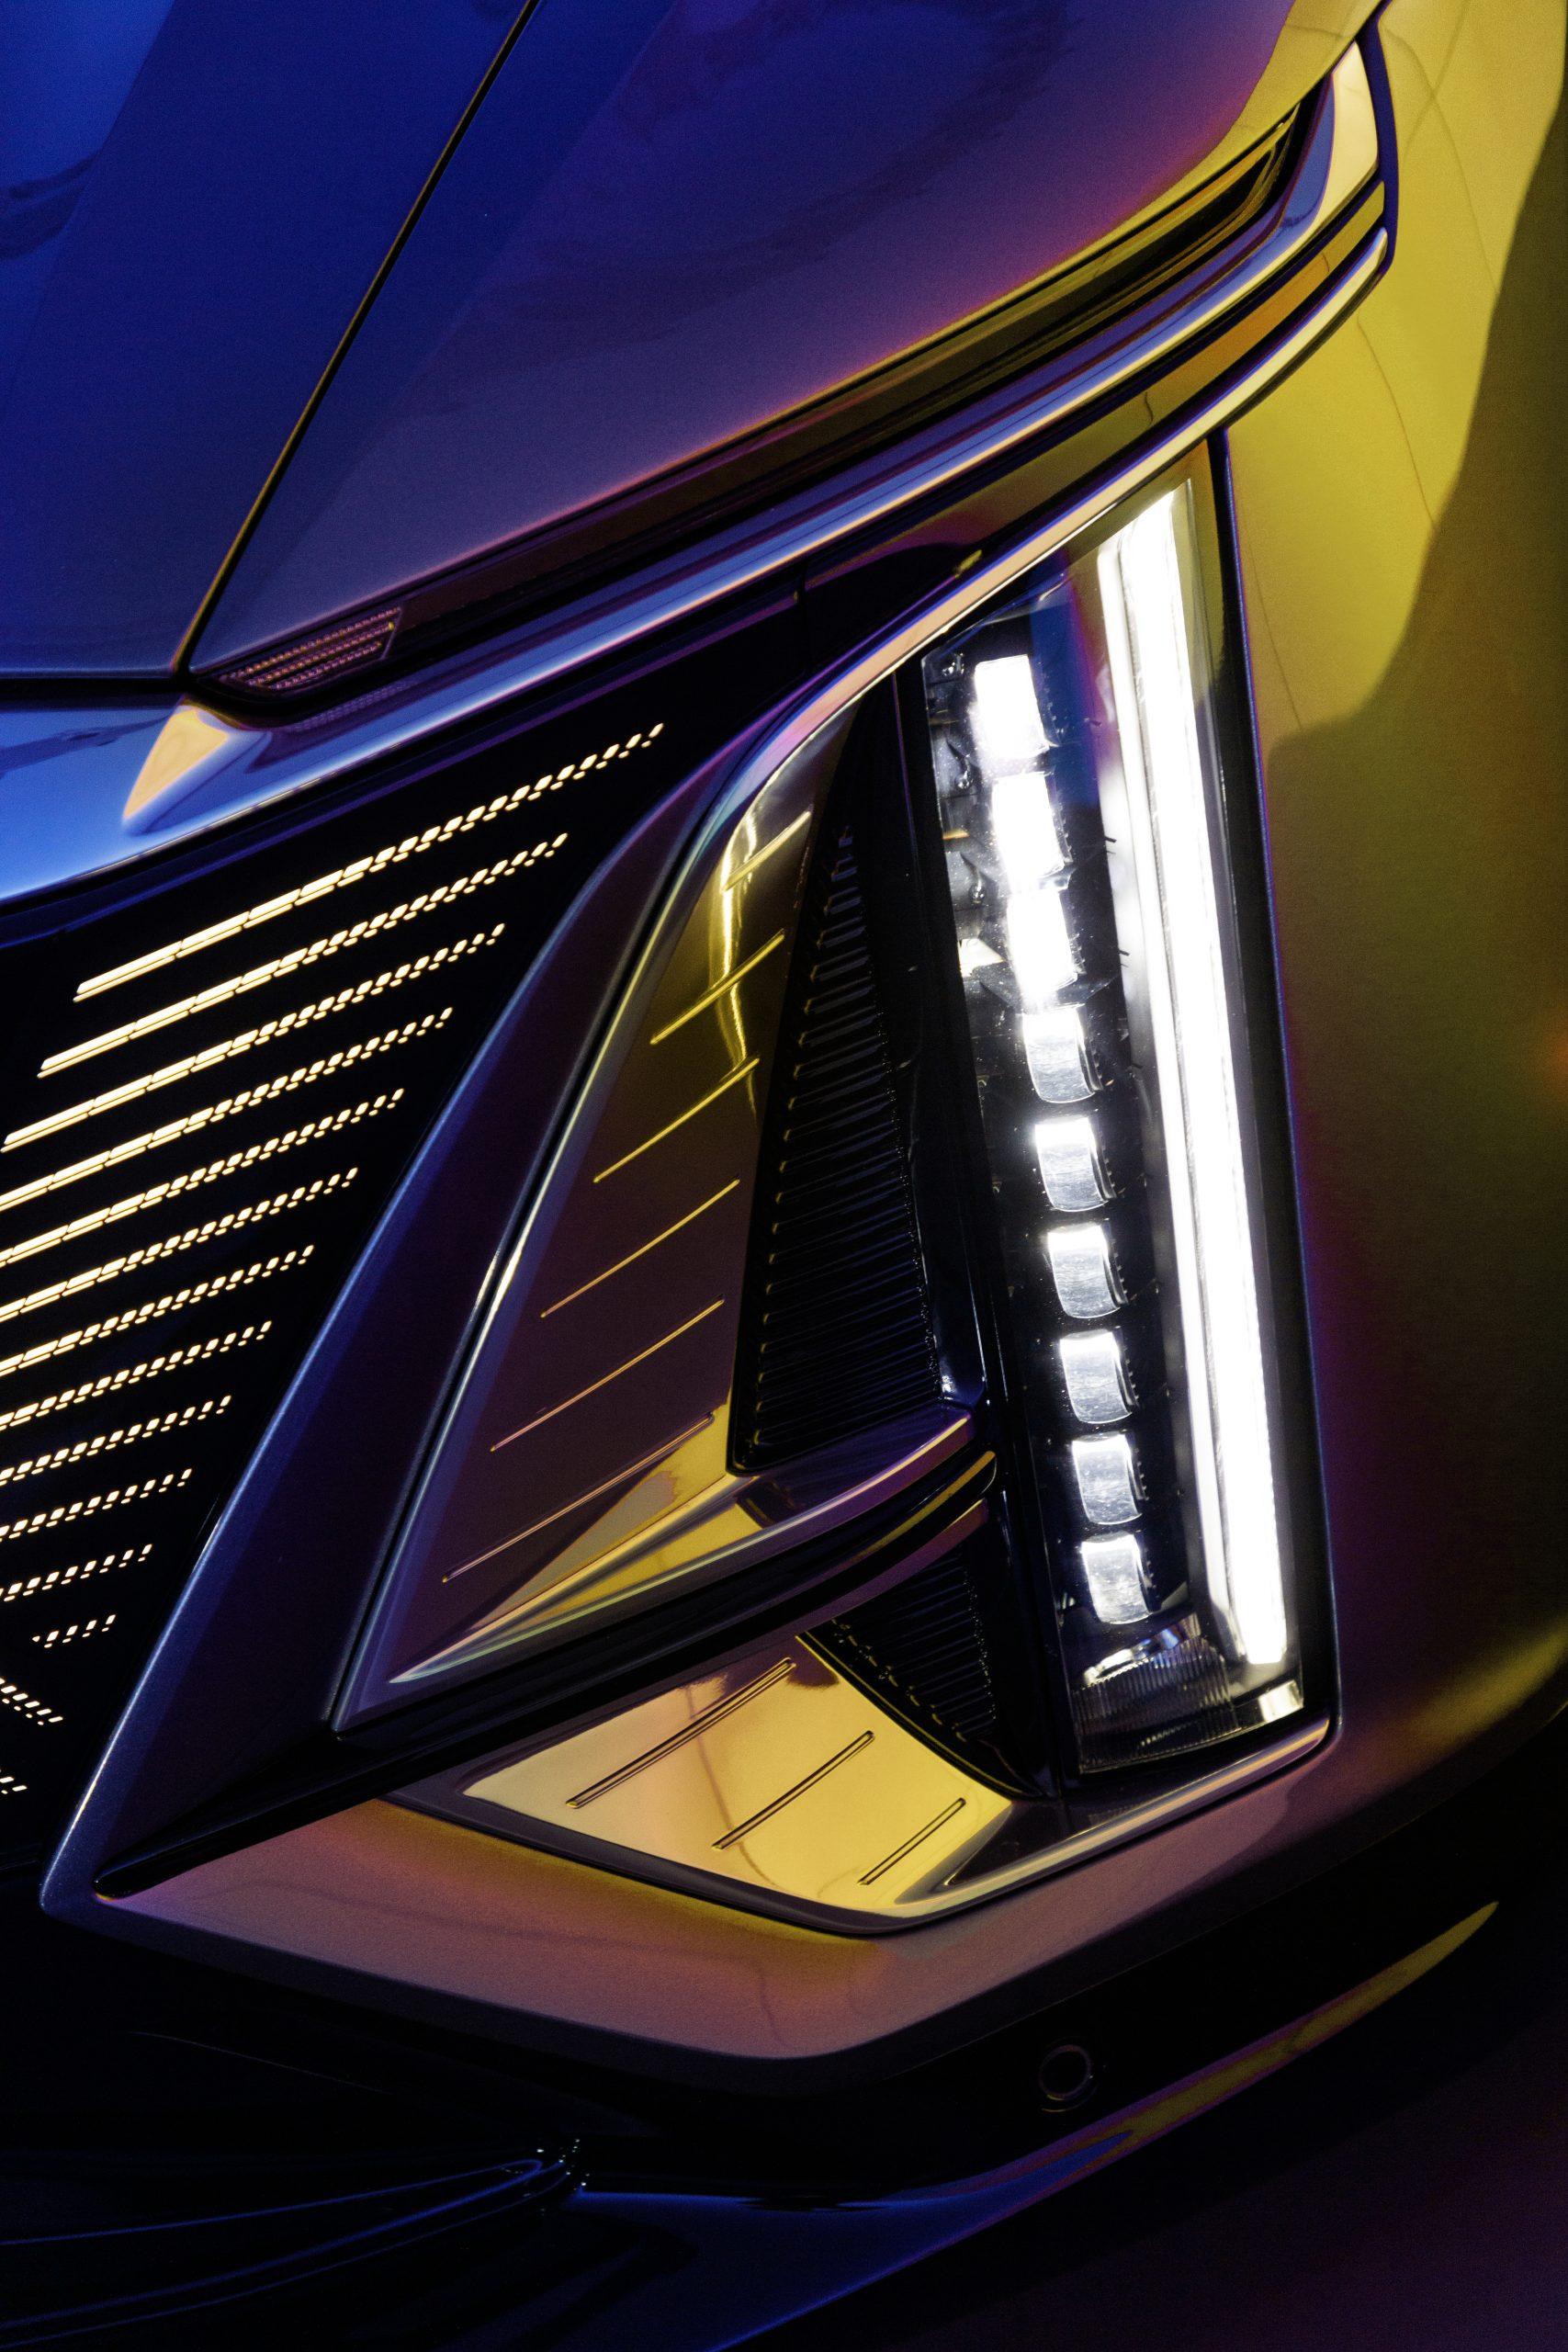 2023 Cadillac Lyriq exterior front slimeline LED headlight